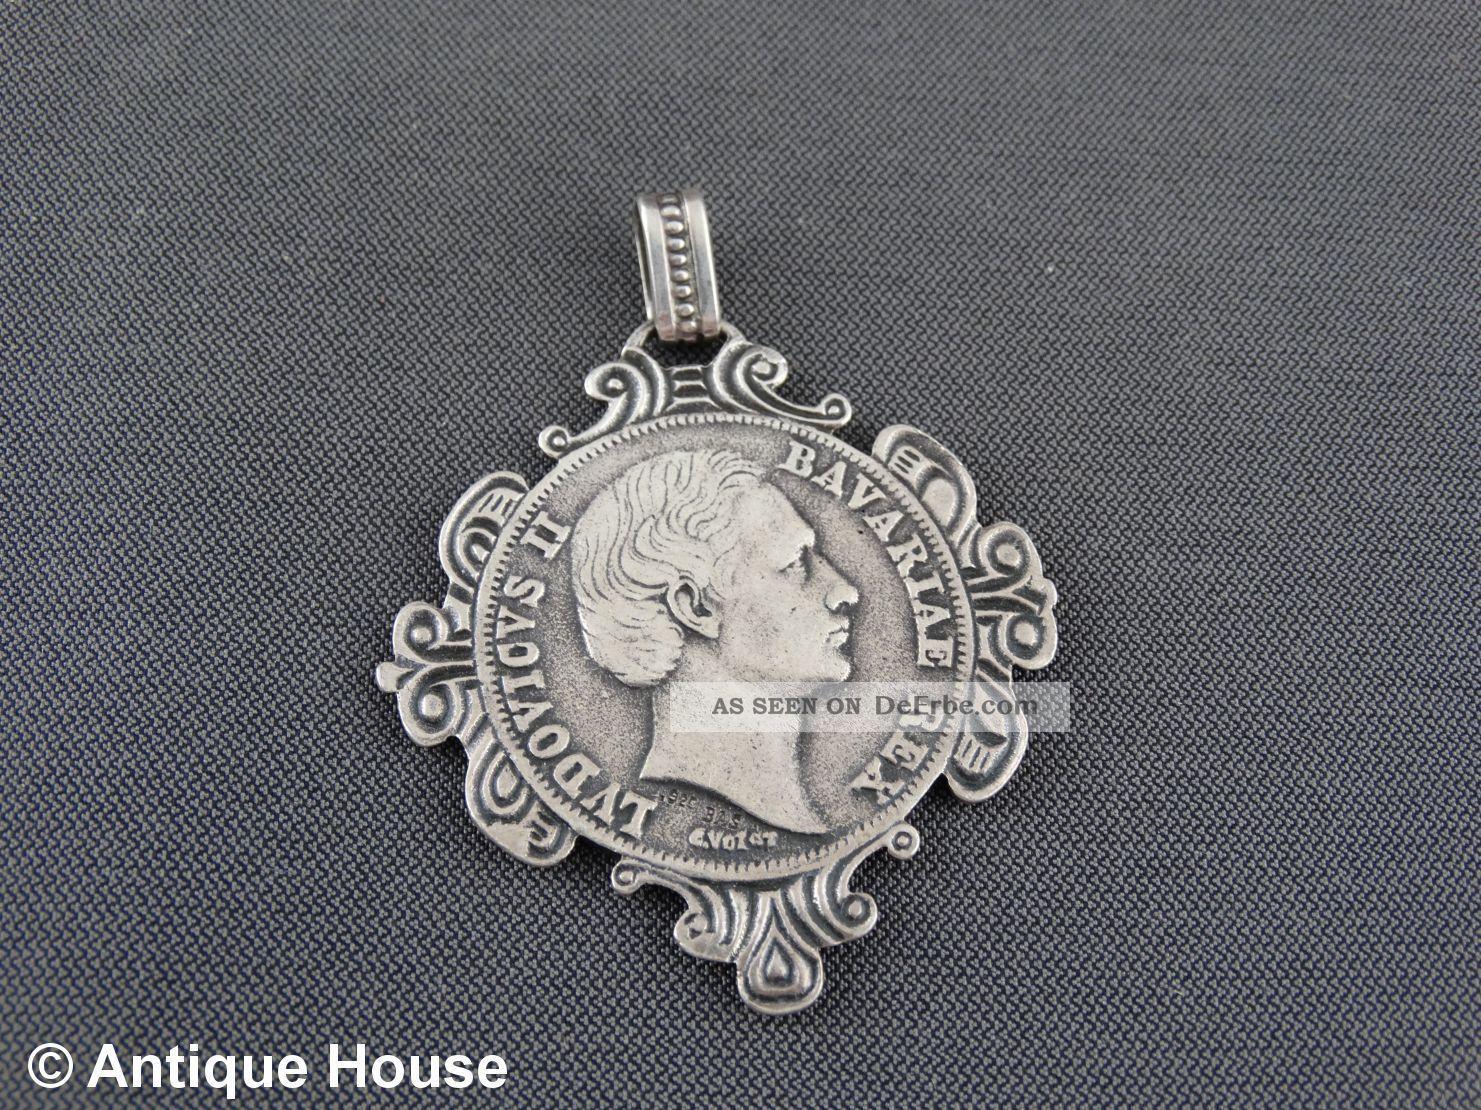 Schmuck Schmuckstück Silber 925 Anhänger Bayrische Medaille Ludwig Ii Schmuck & Accessoires Bild